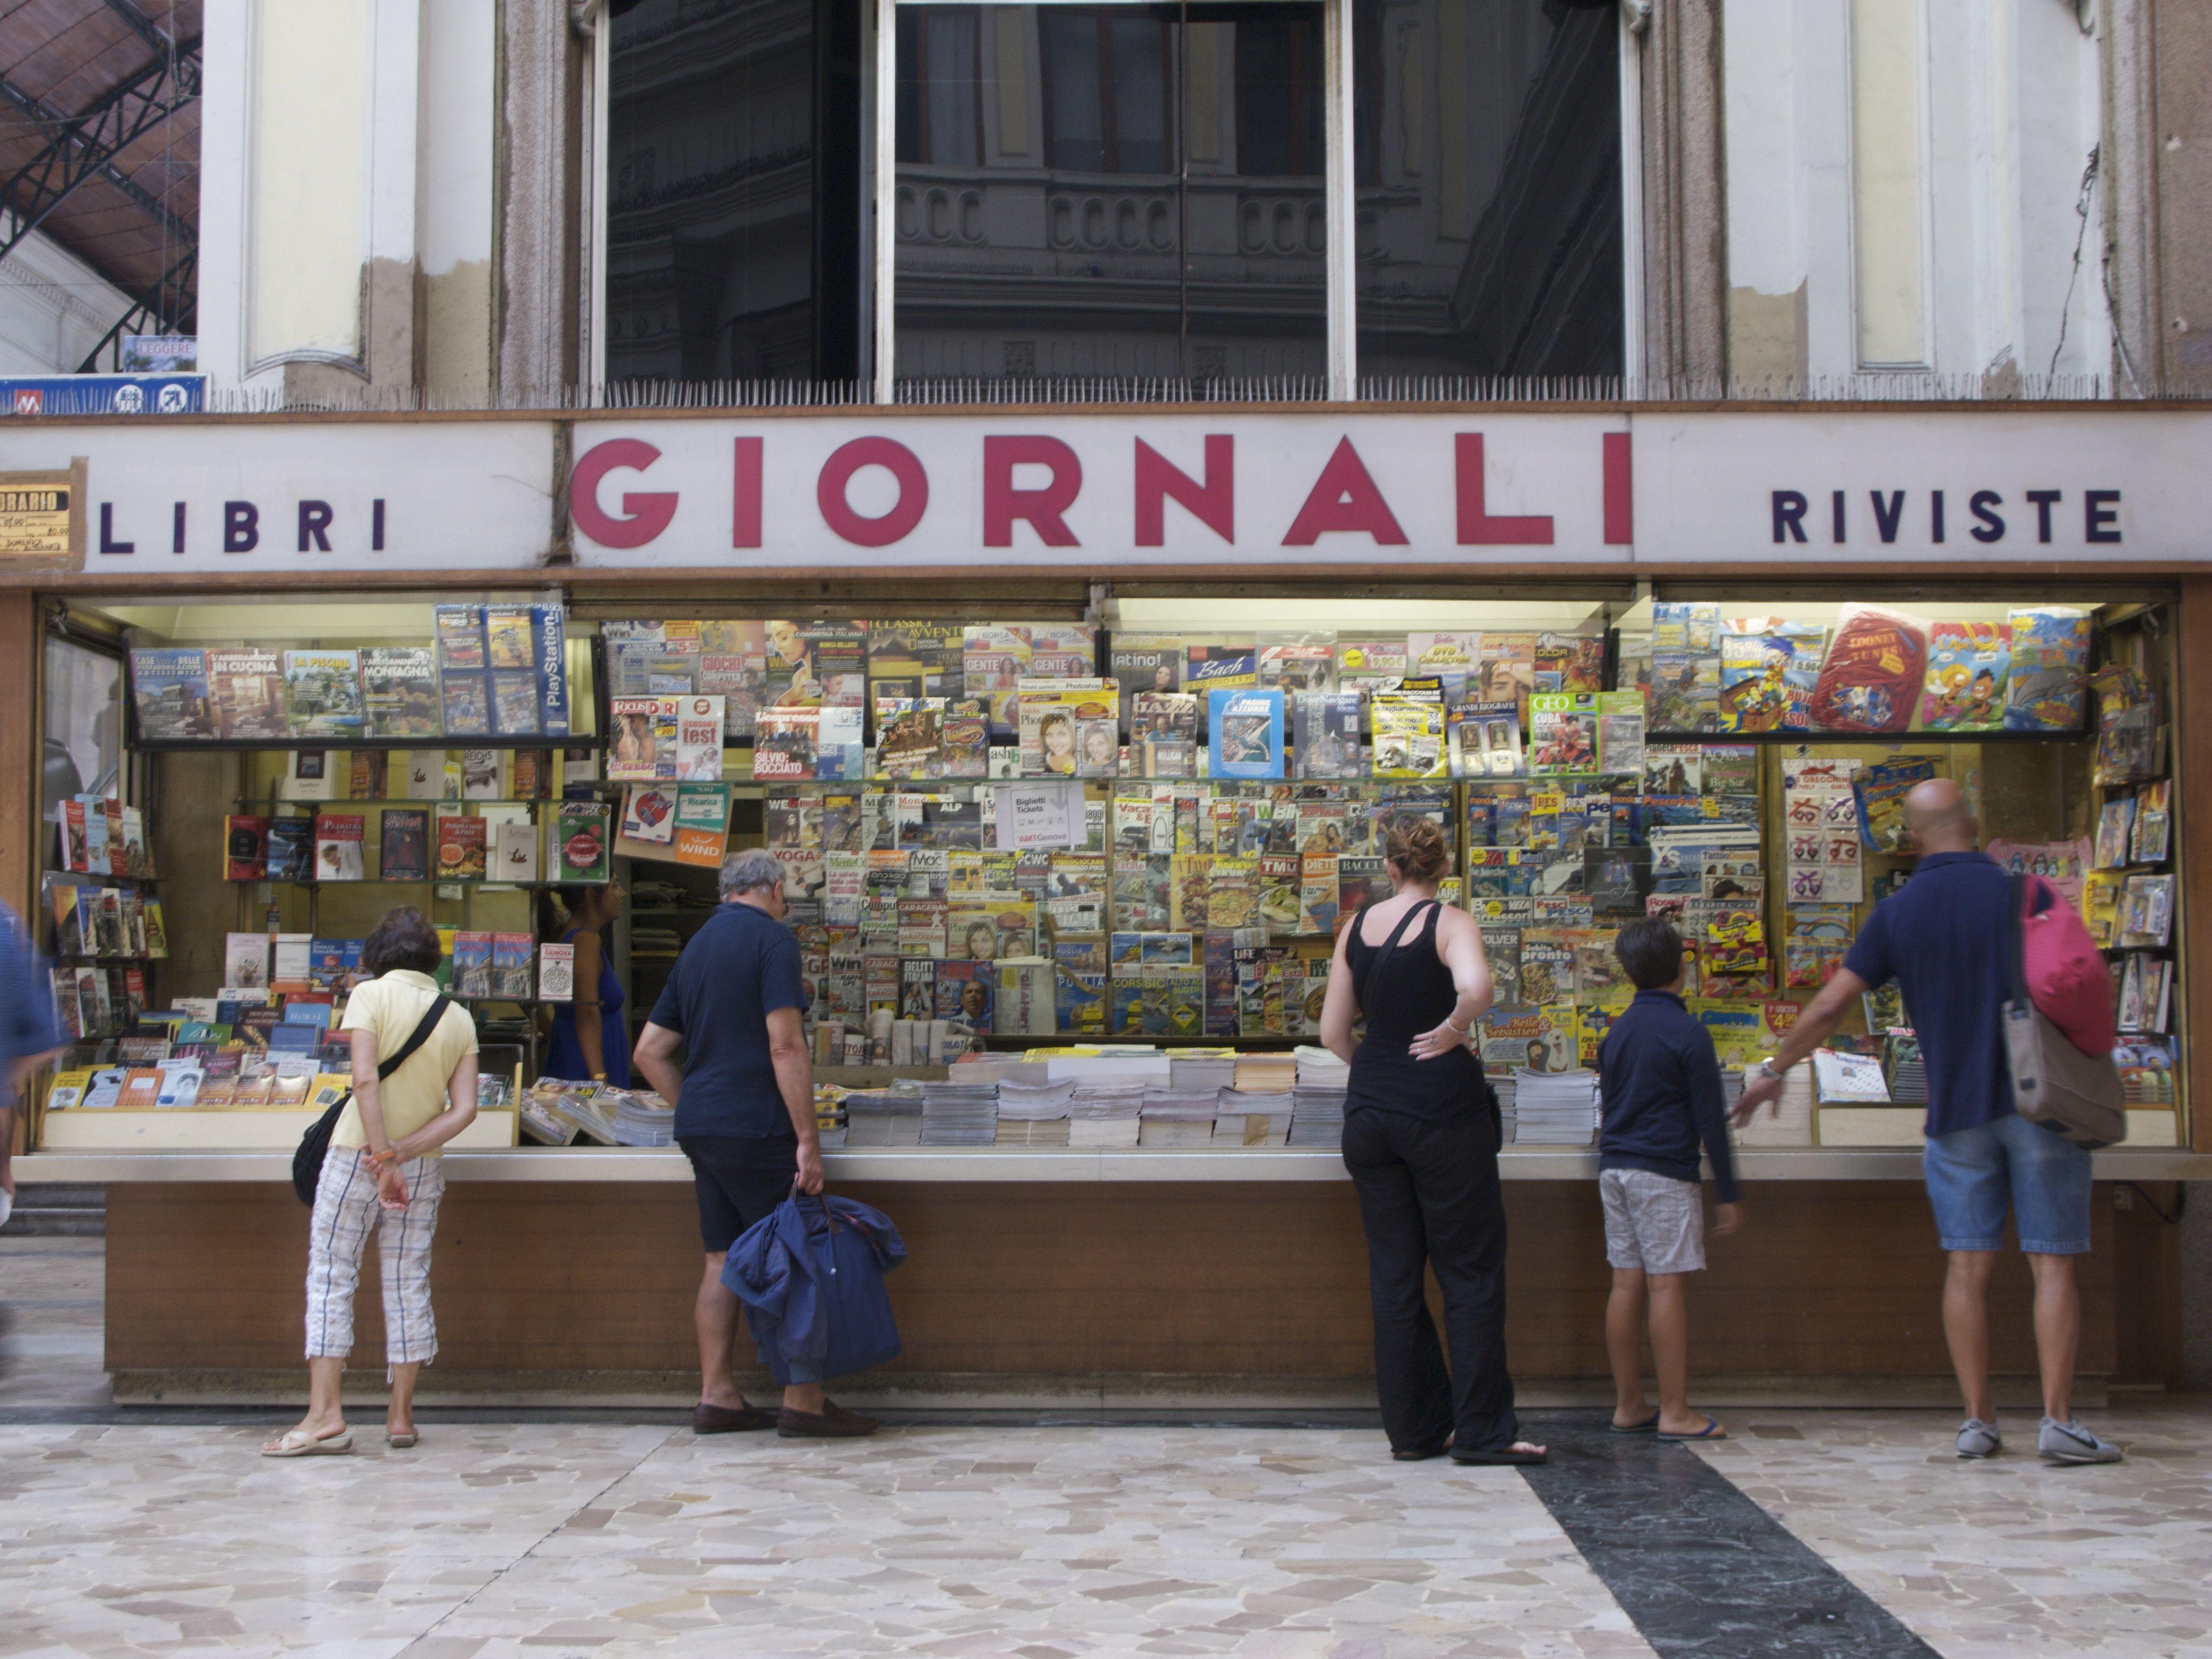 Newspaper stand, Genoa, Italy